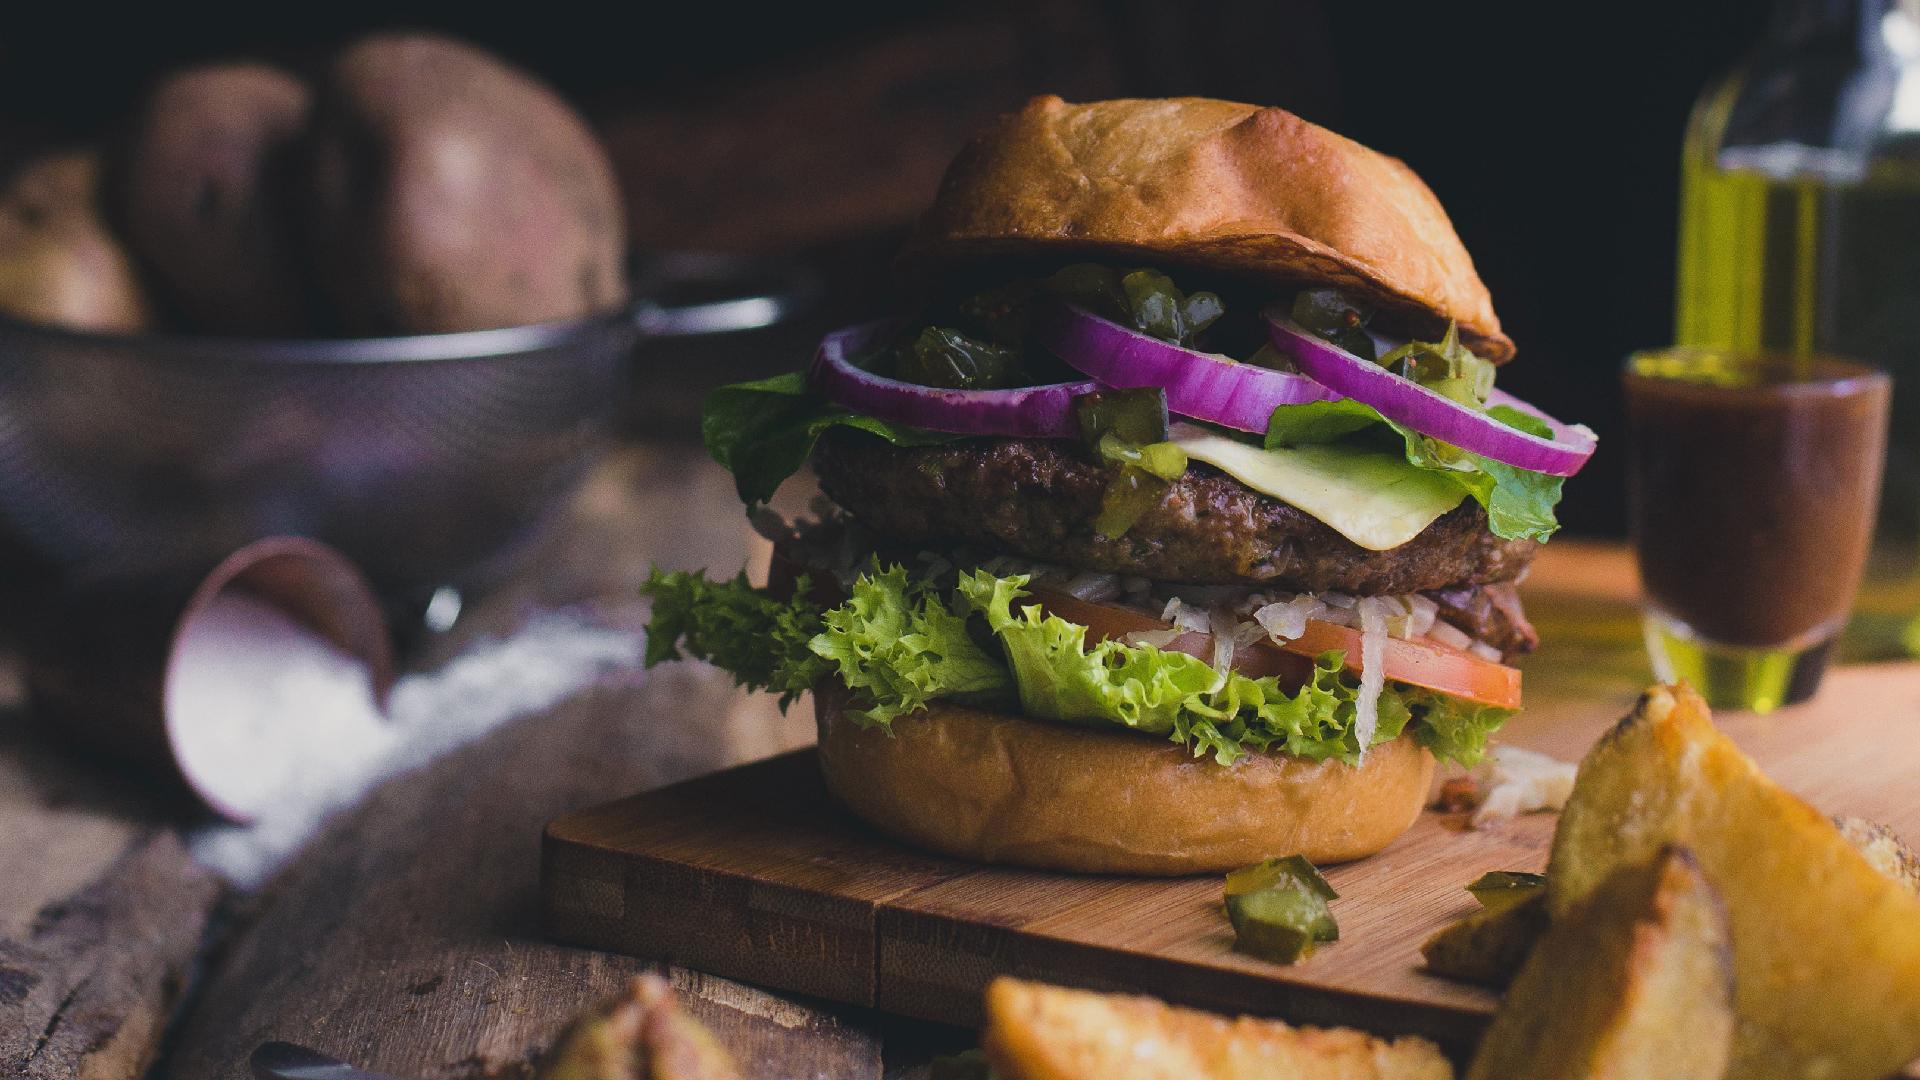 Manraj Ubhi - Stacked Burger